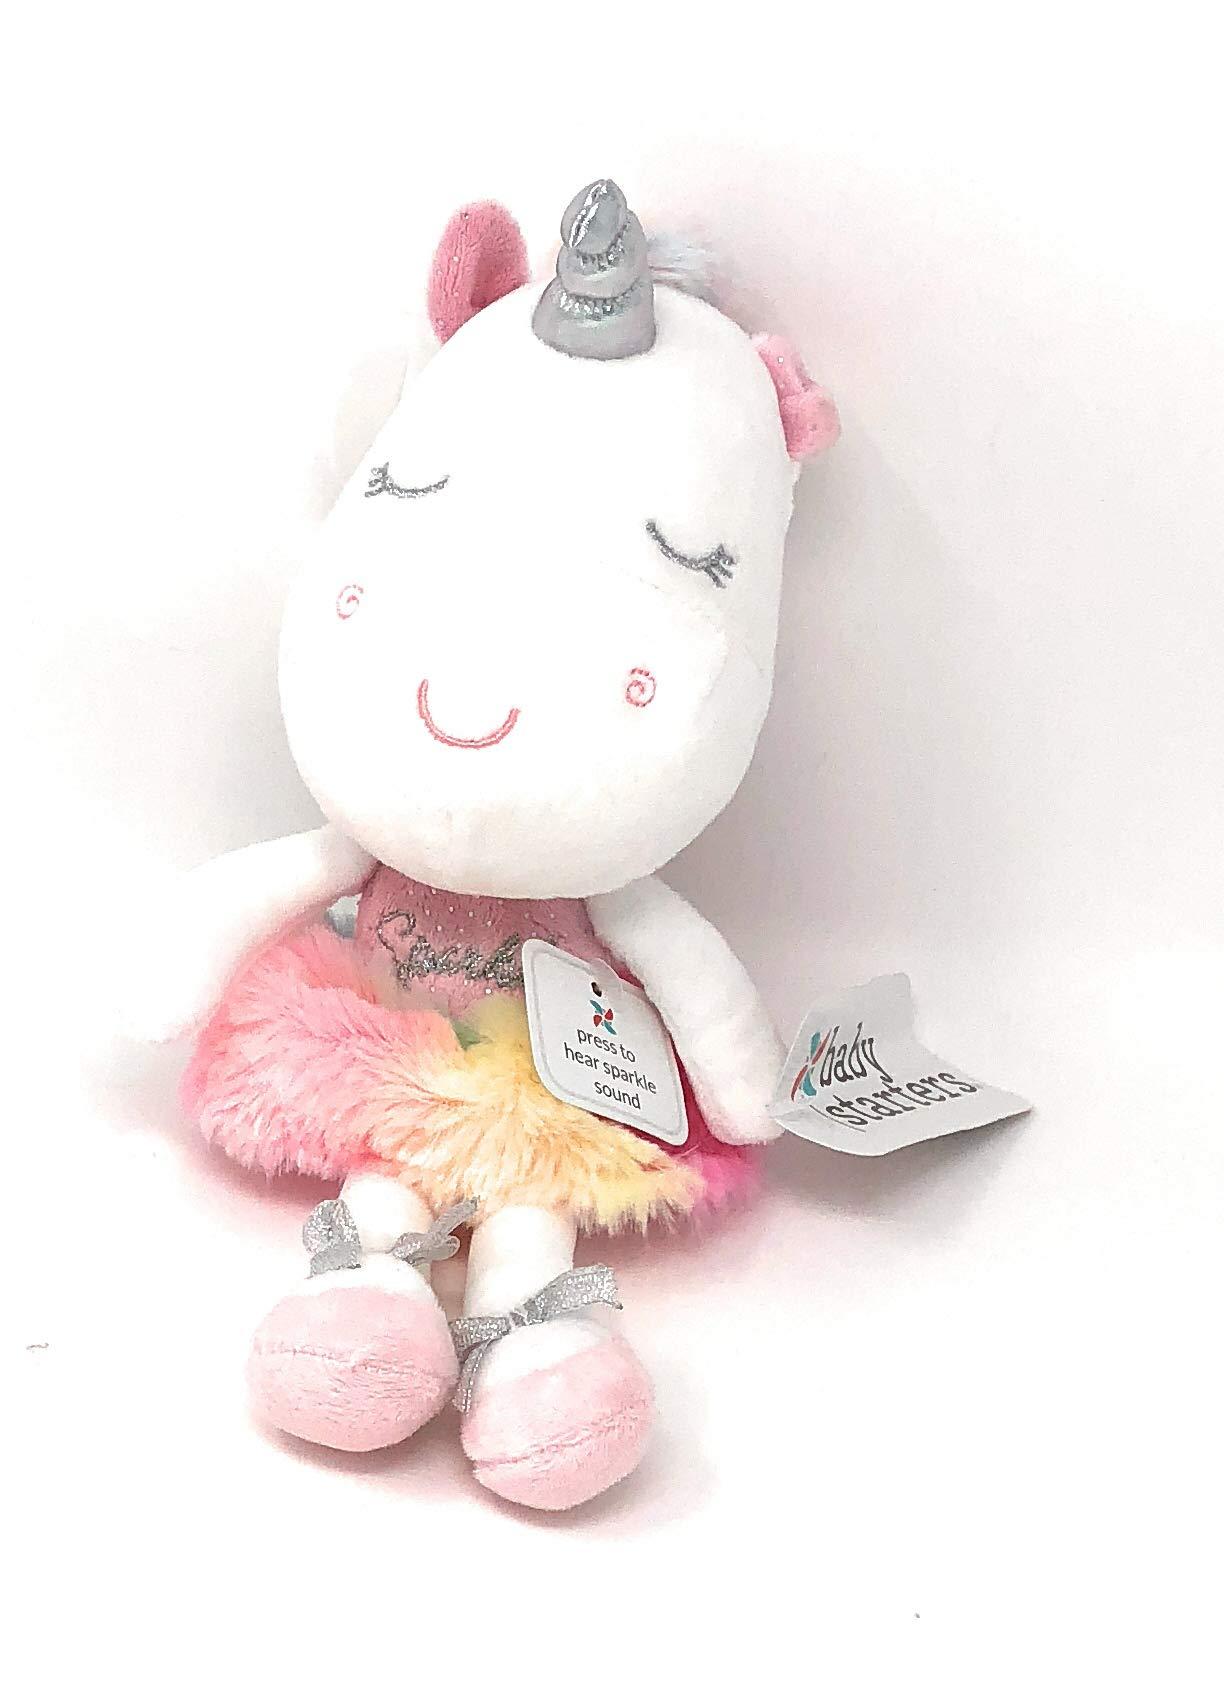 Baby Starters Ballet Tutu Rainbow Plush Unicorn ~ Dancing Ballerina | Press My Tummy to Hear Sparkle Sound | 12 in Tall by Baby Starters (Image #2)